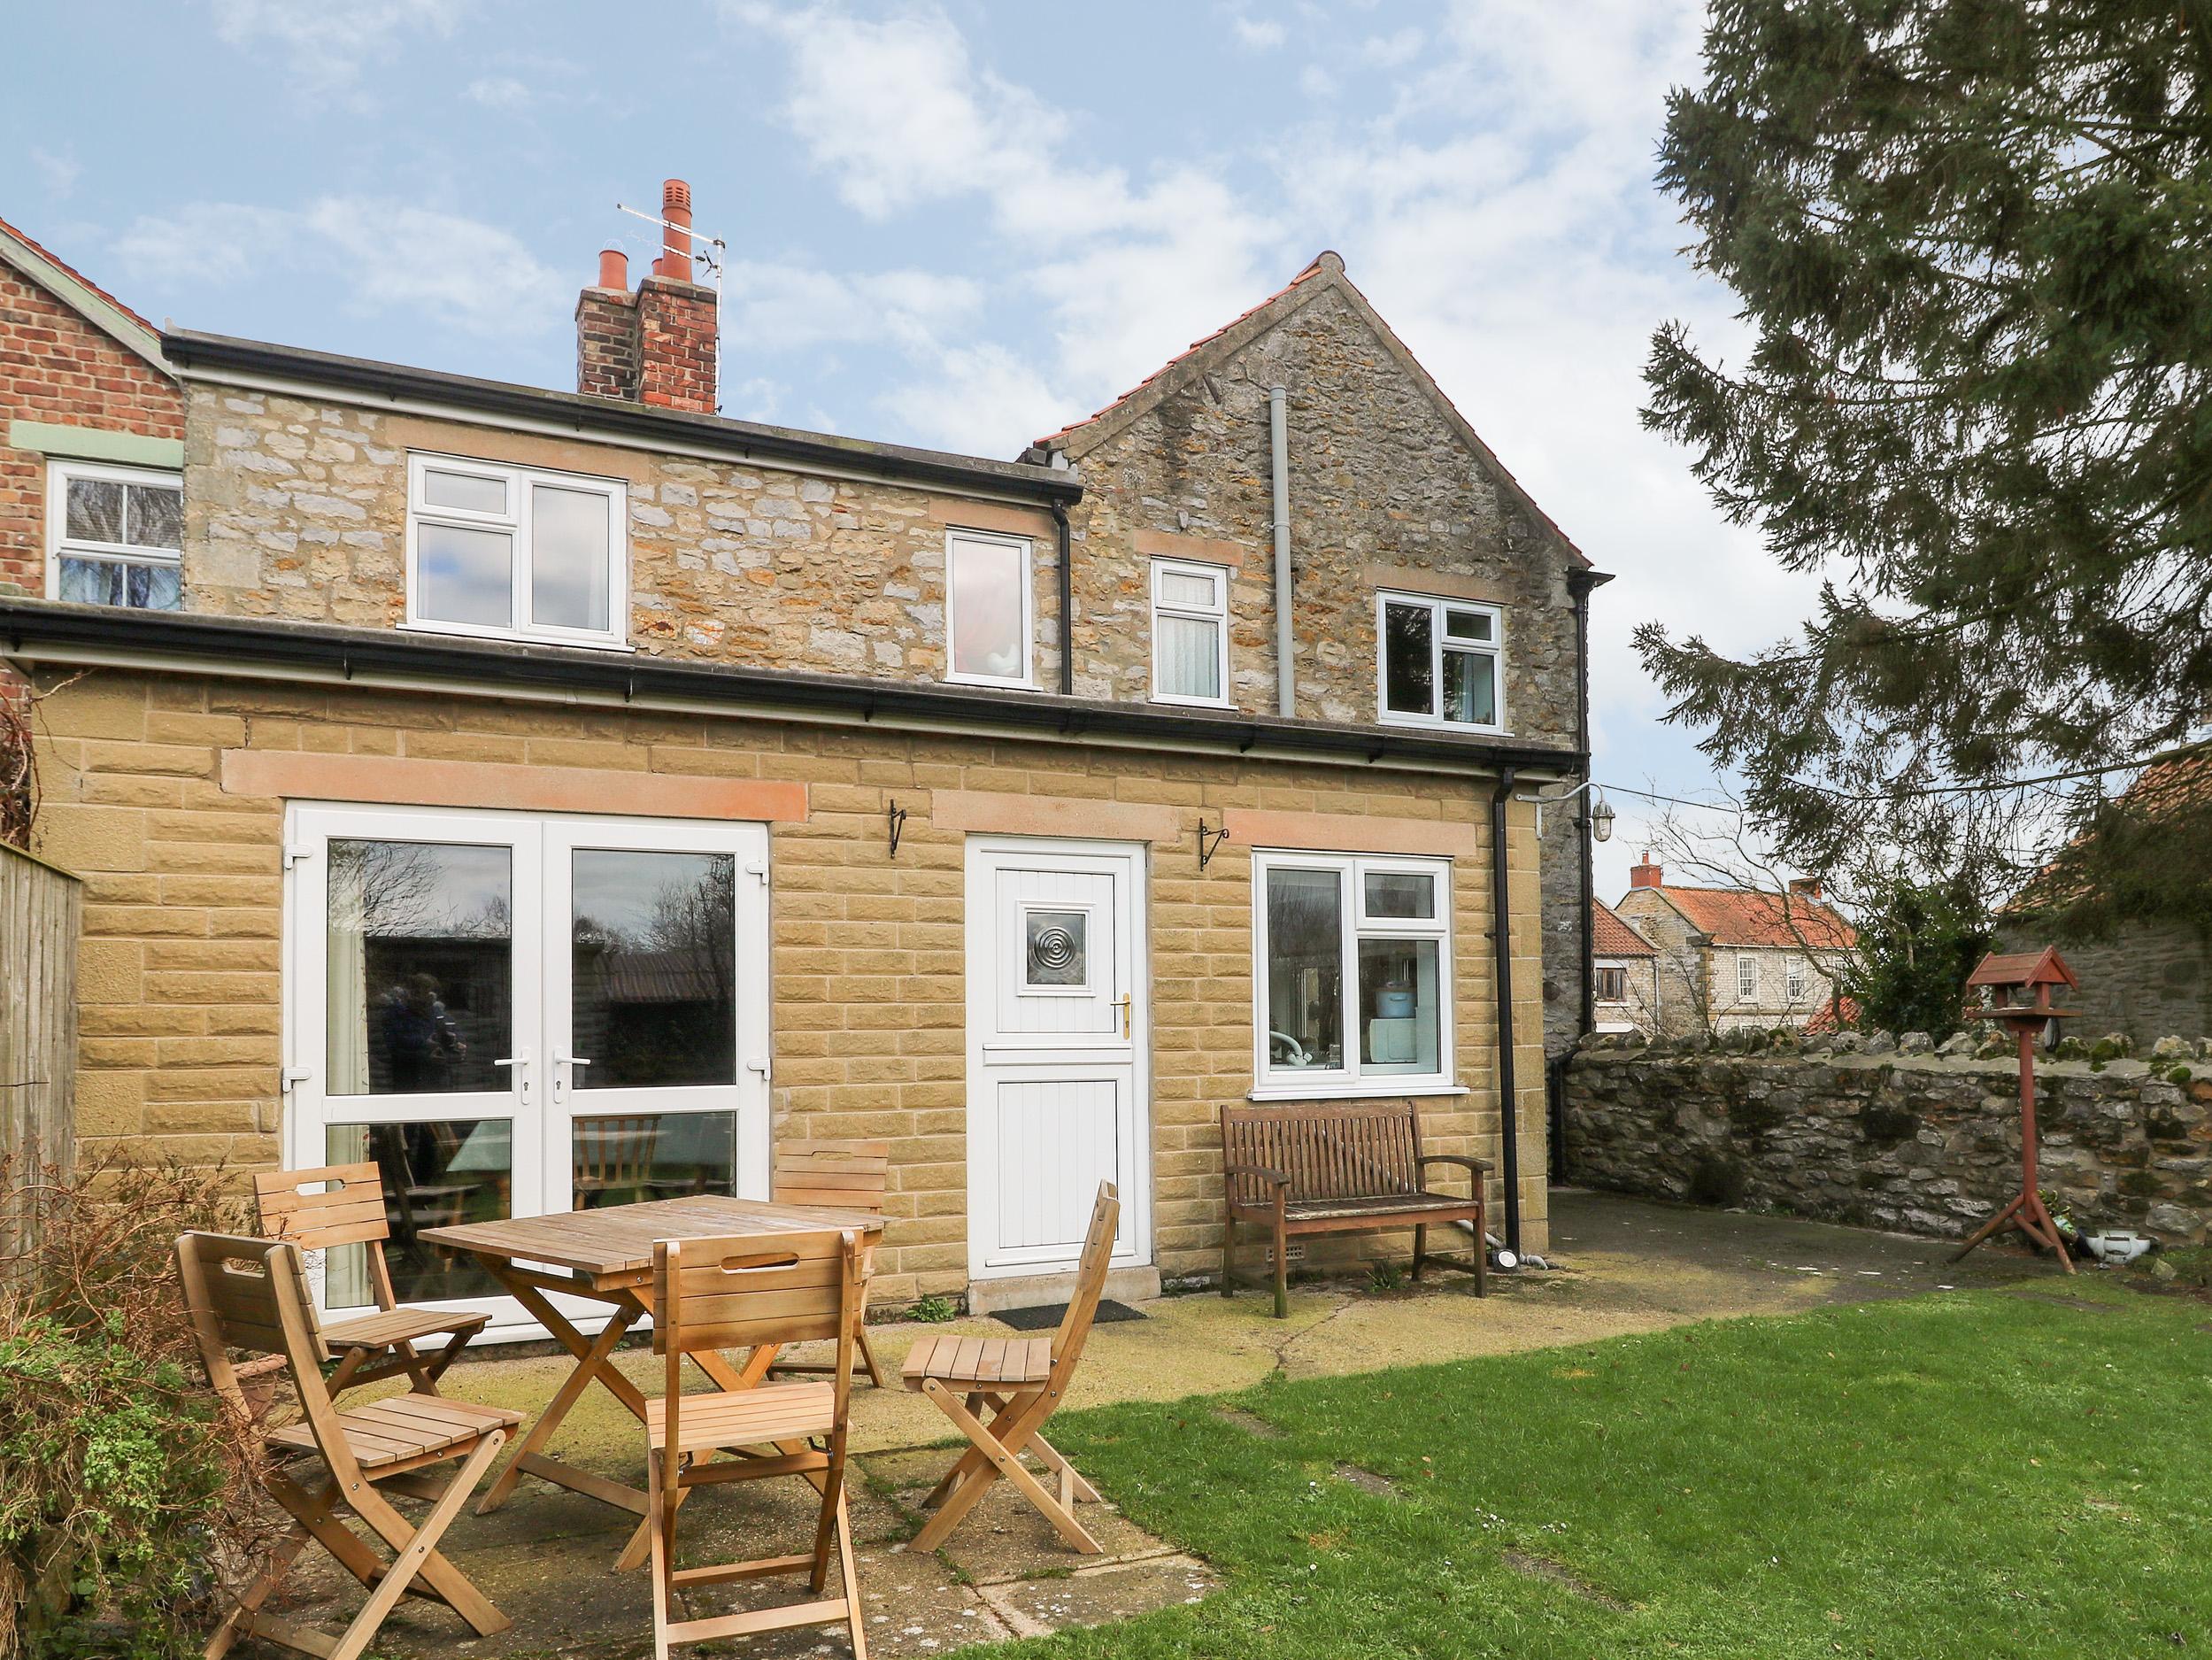 3 bedroom Cottage for rent in York